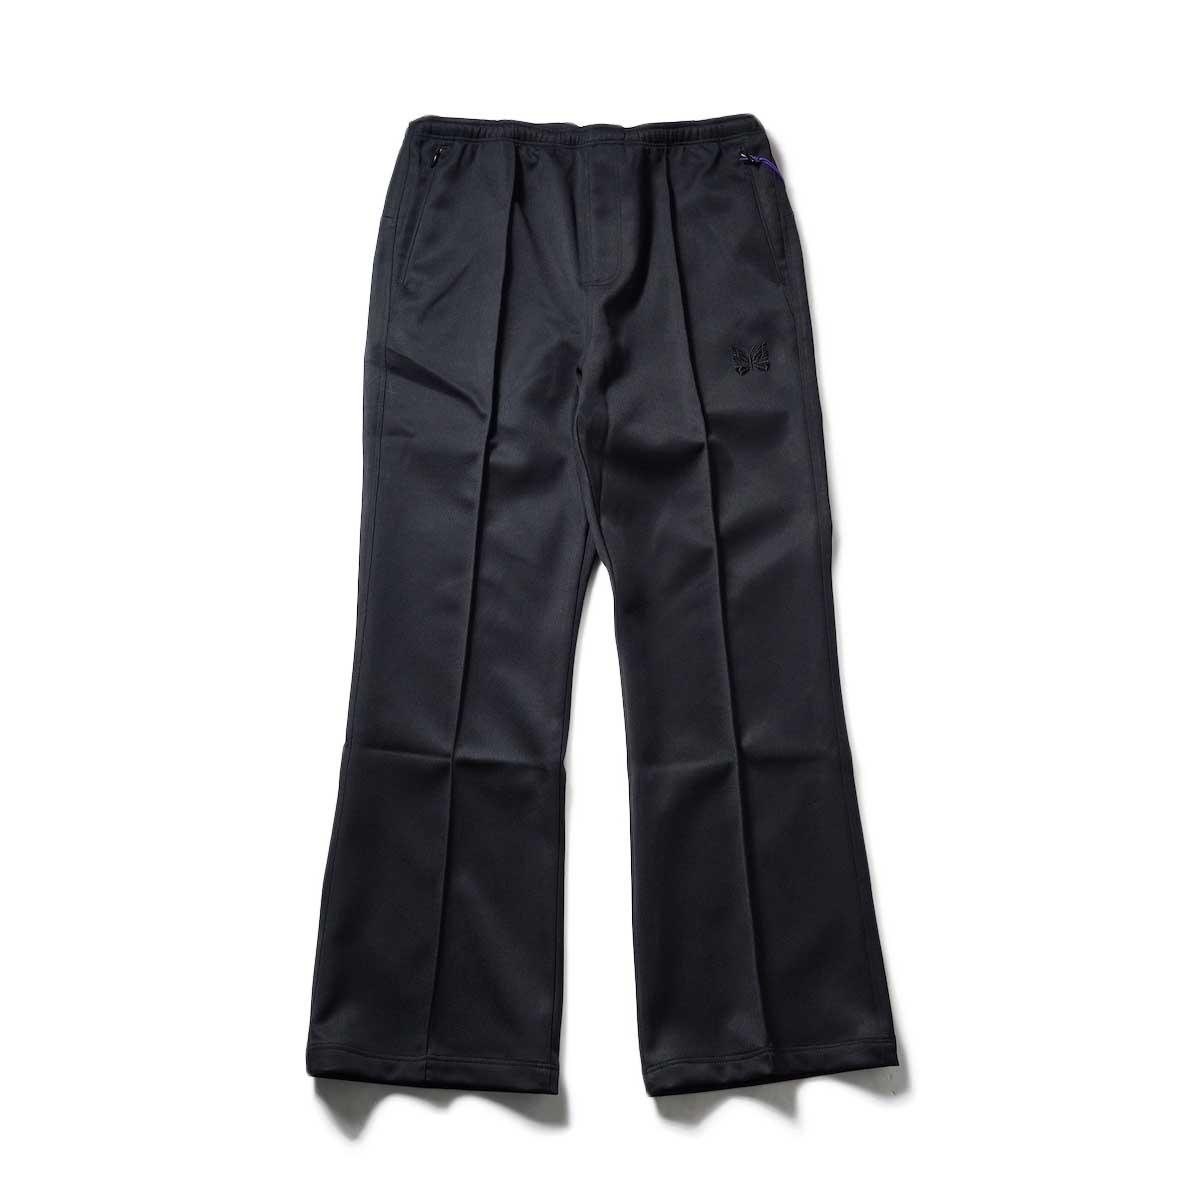 Needles / W.U. BOOT-CUT PANT - PE/R DOESKIN (Black)正面